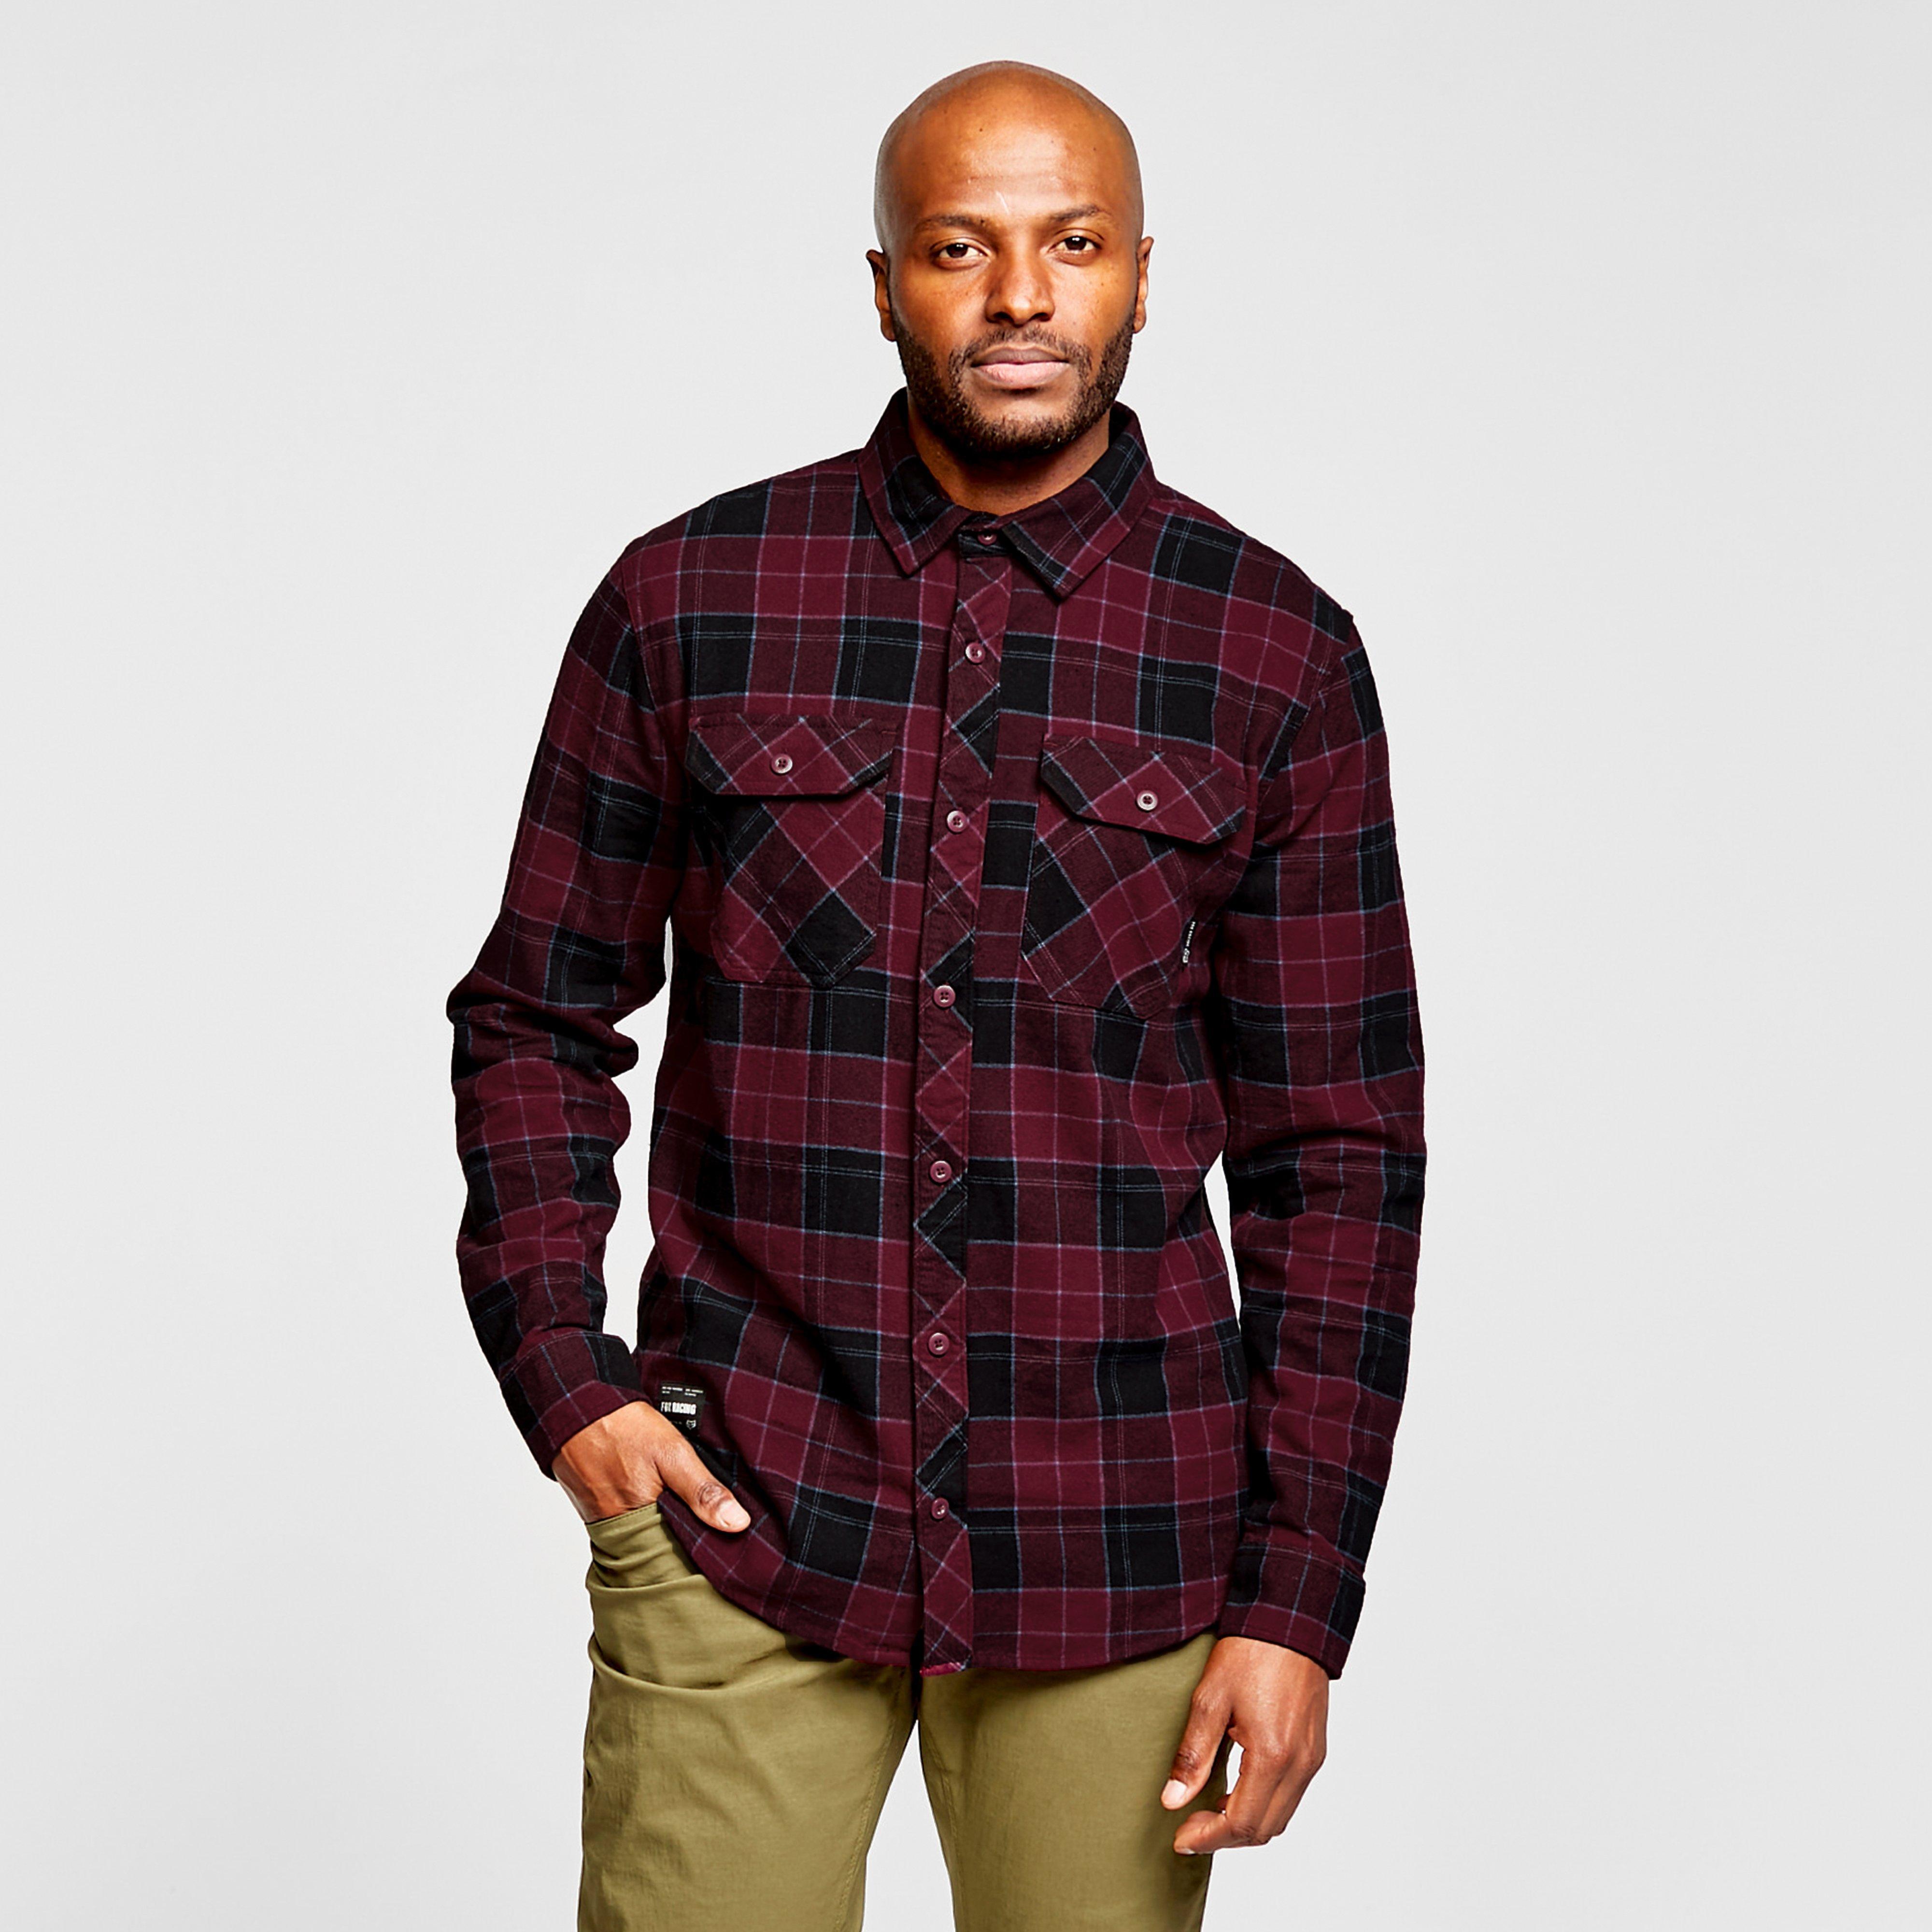 Fox Men's Traildust 2.0 Flannel Shirt - Cranberry/Drd, Burgundy